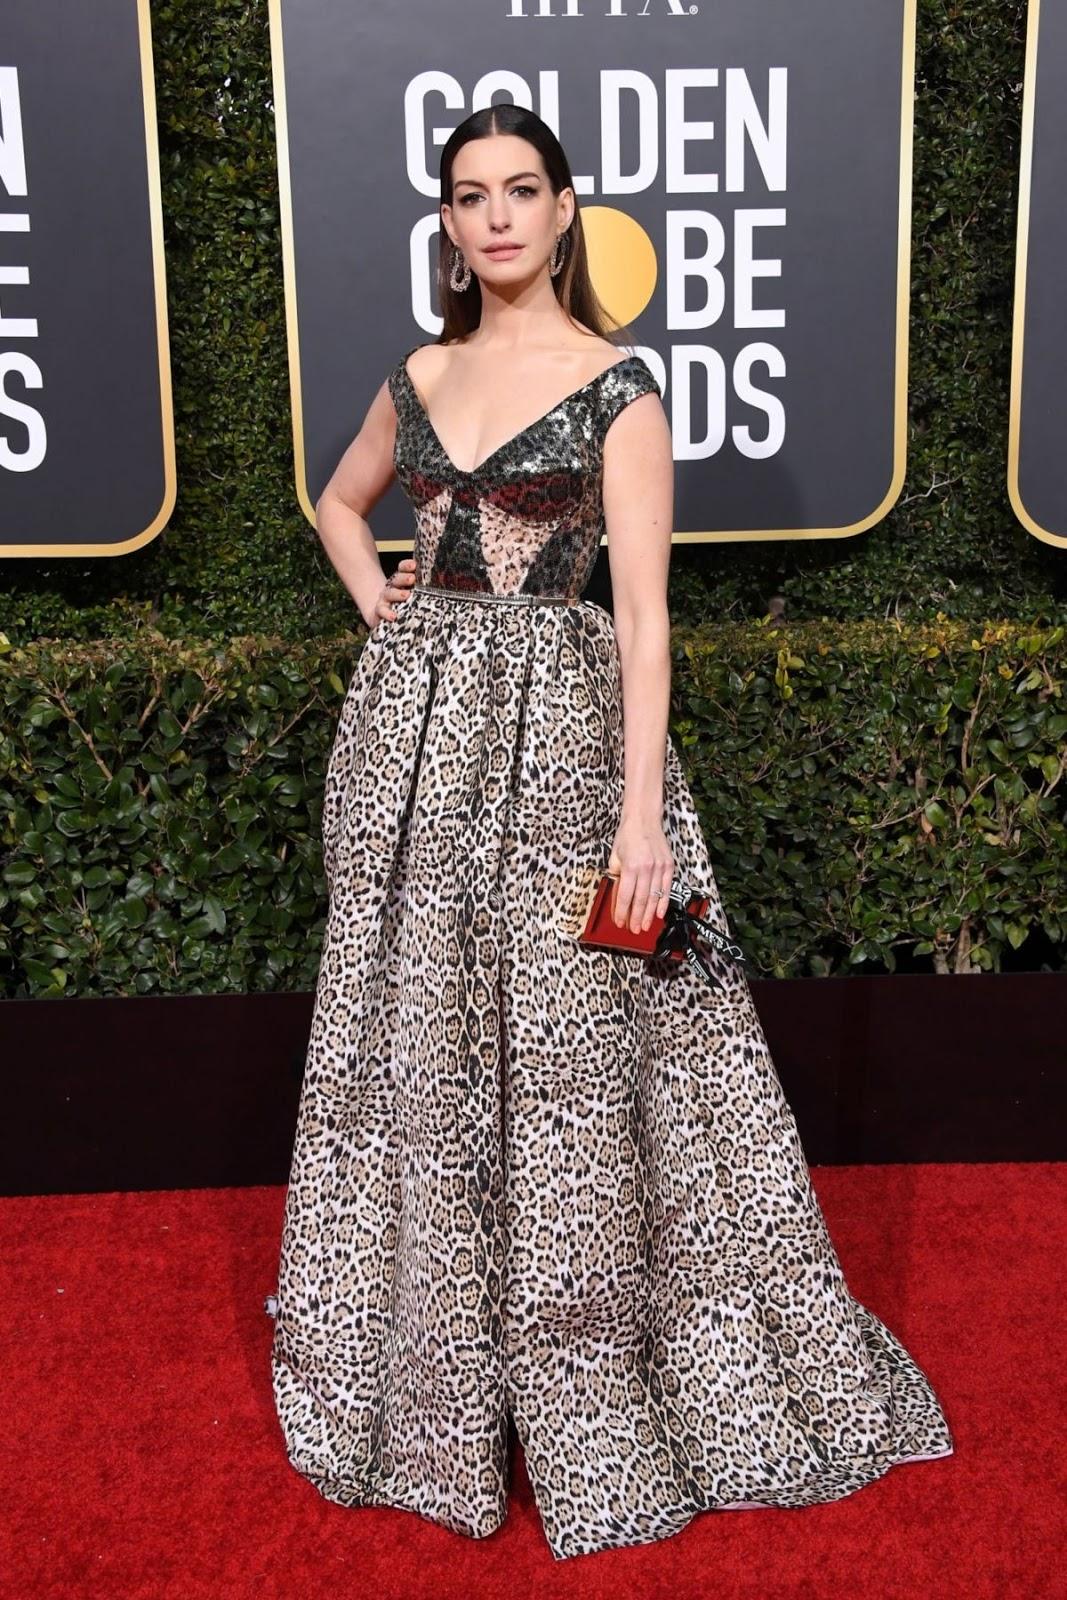 Anne Hathaway at 2019 Golden Globes